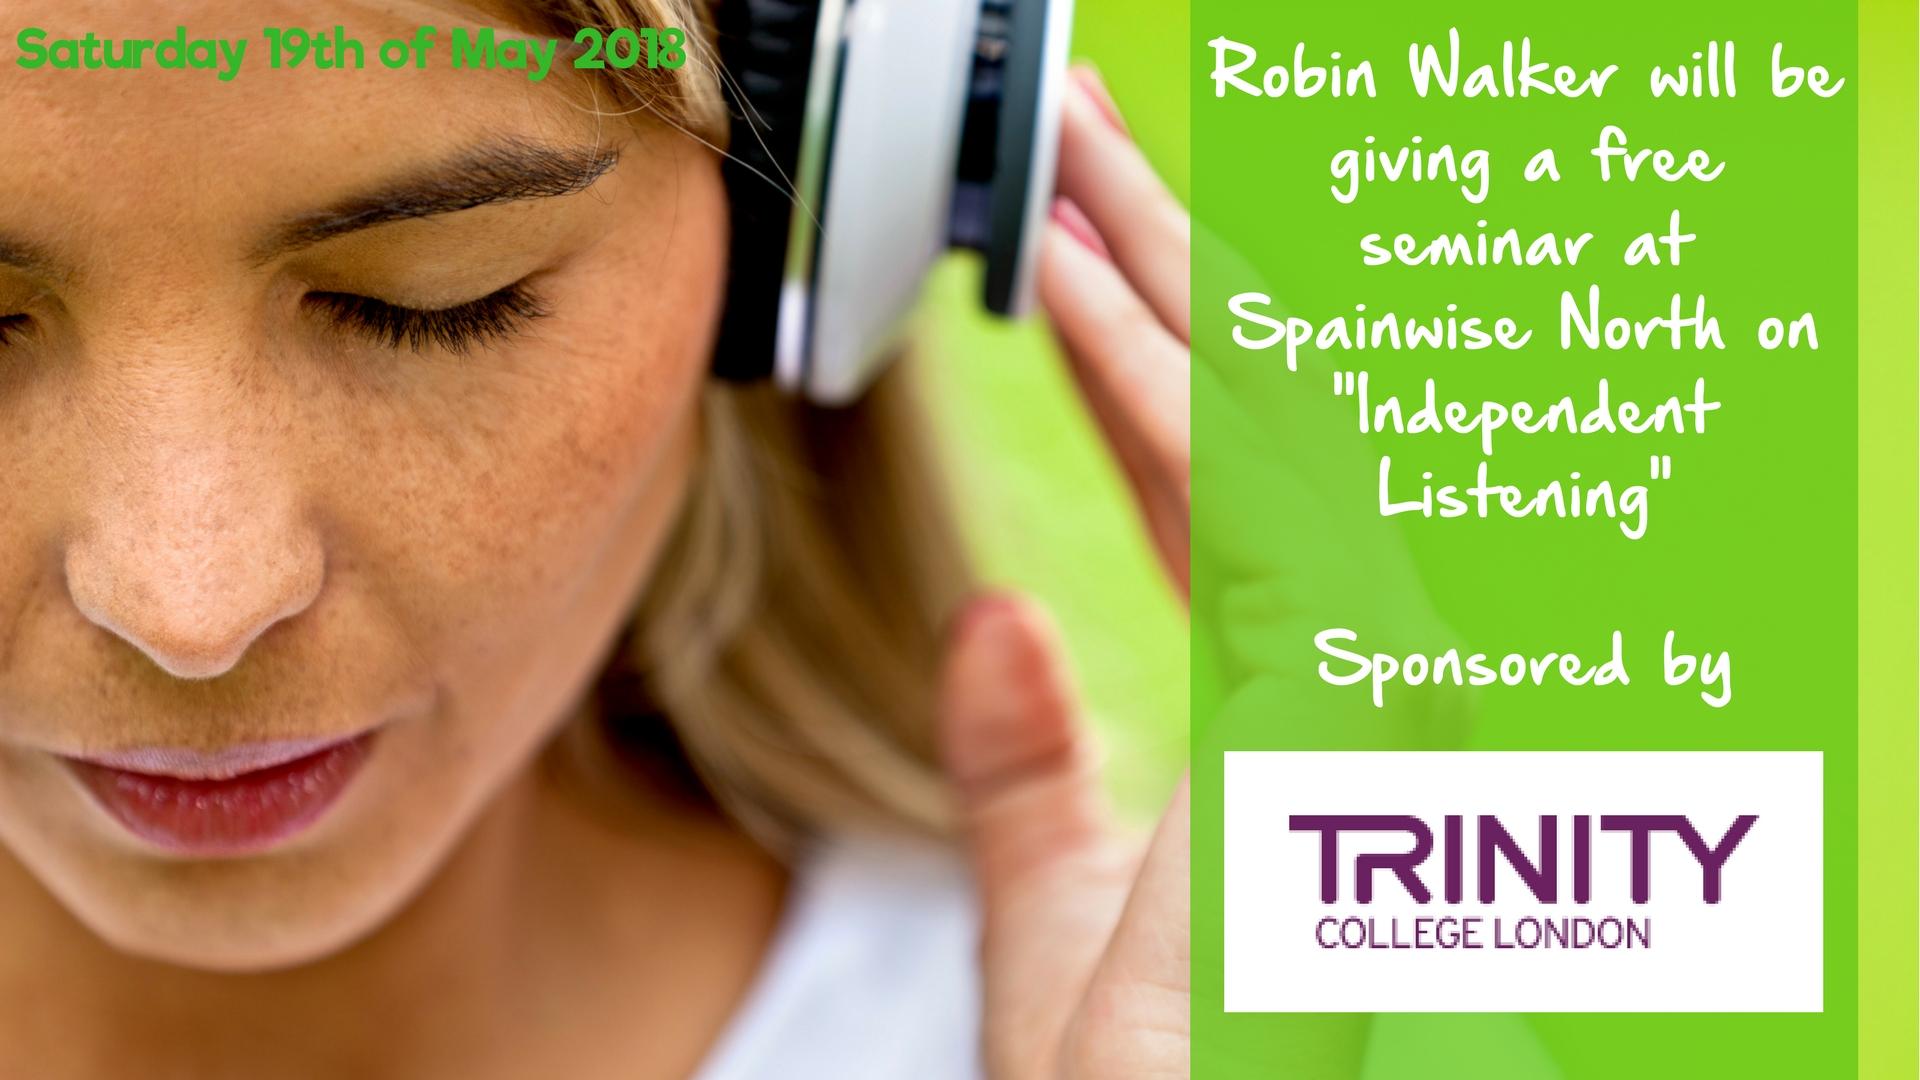 Independent Listening